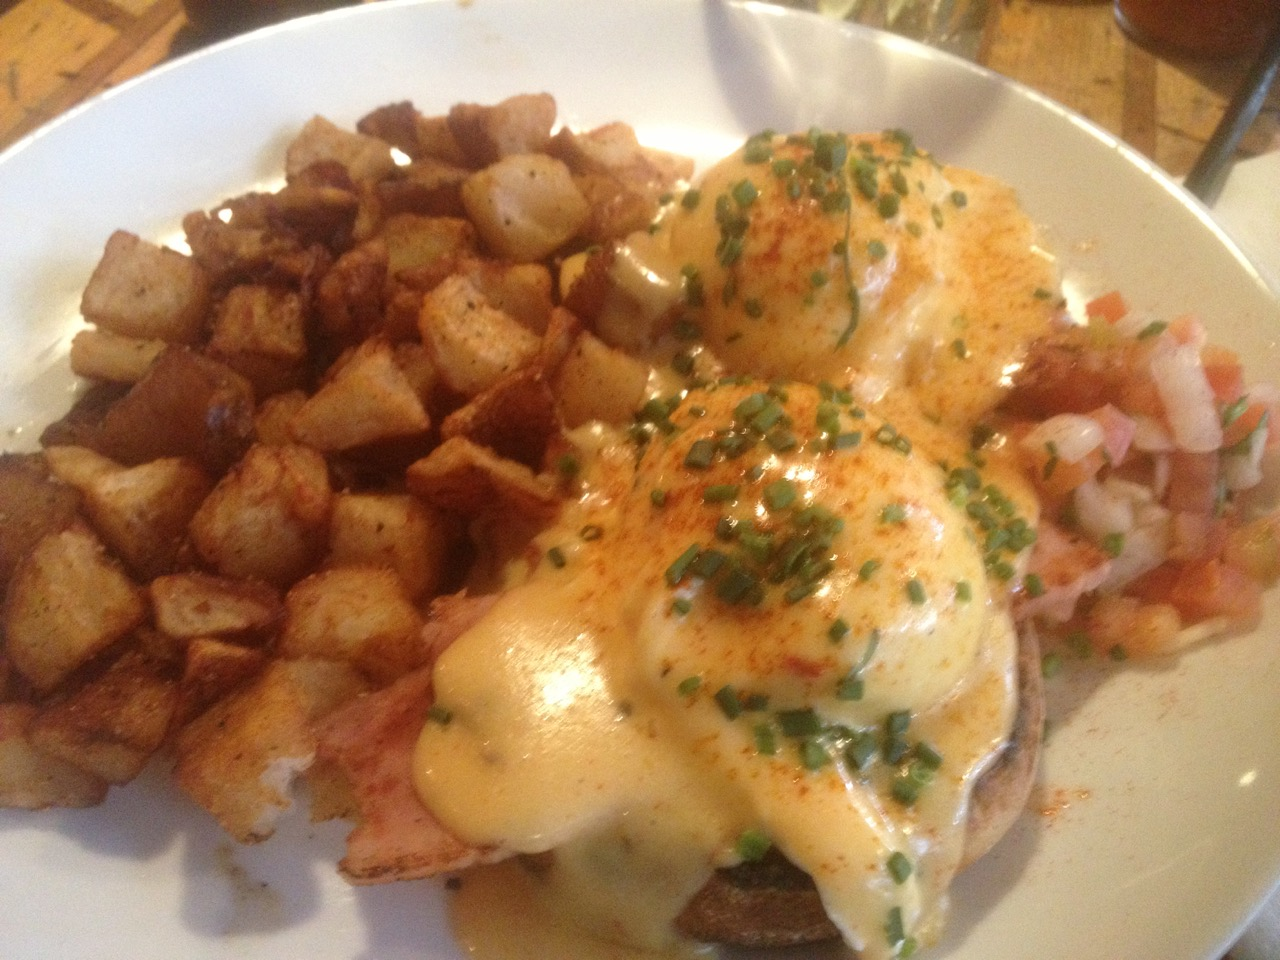 Breakfast at Peso's Kitchen - February 16 2013